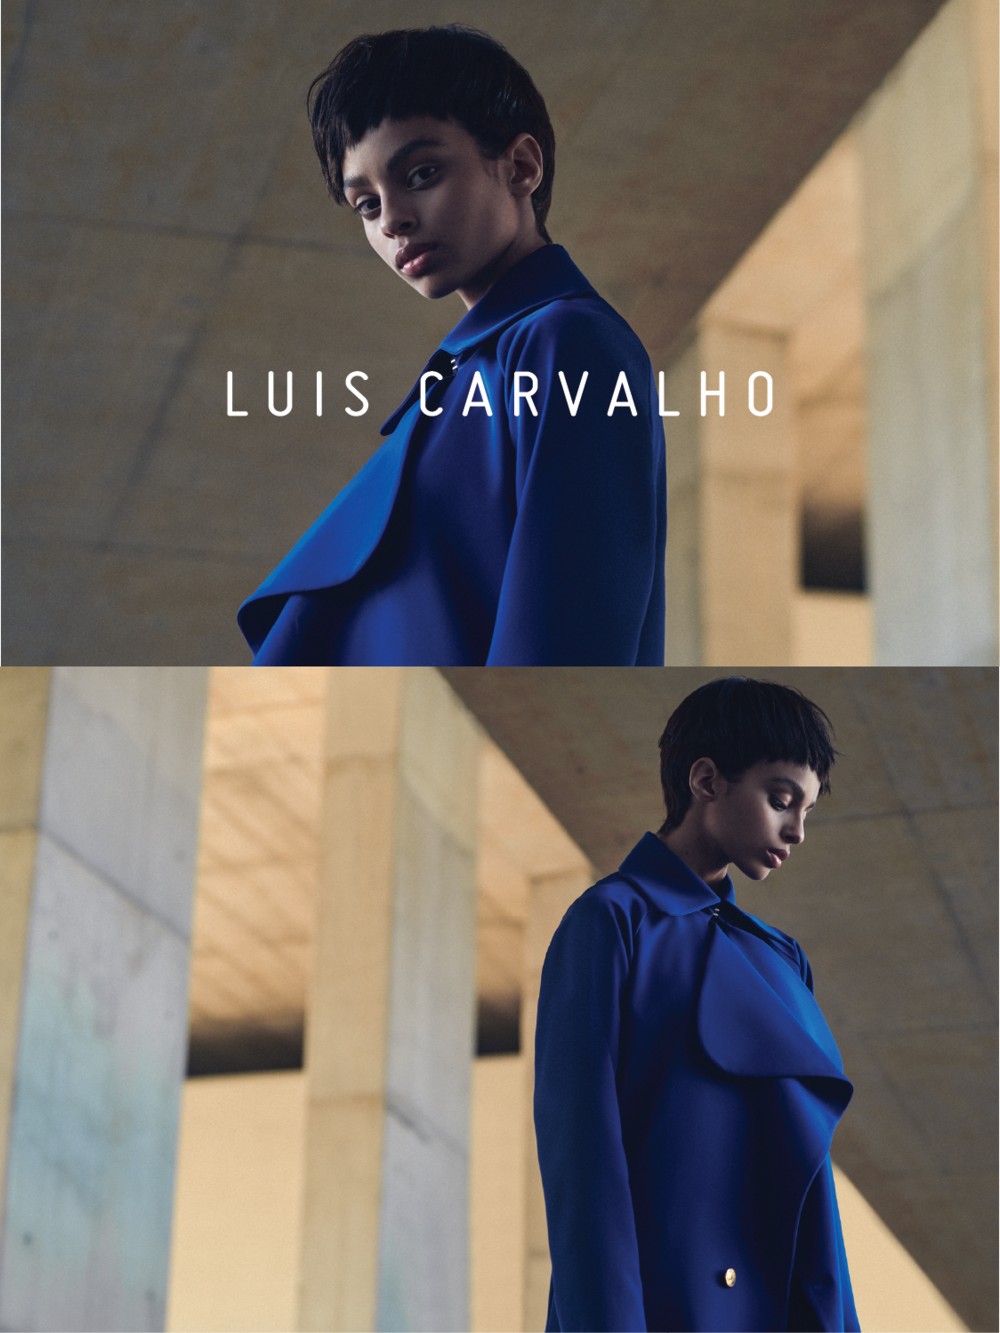 Luis Carvalho, Frederico Martins, Campaign, Lalaland Studios, Porto,